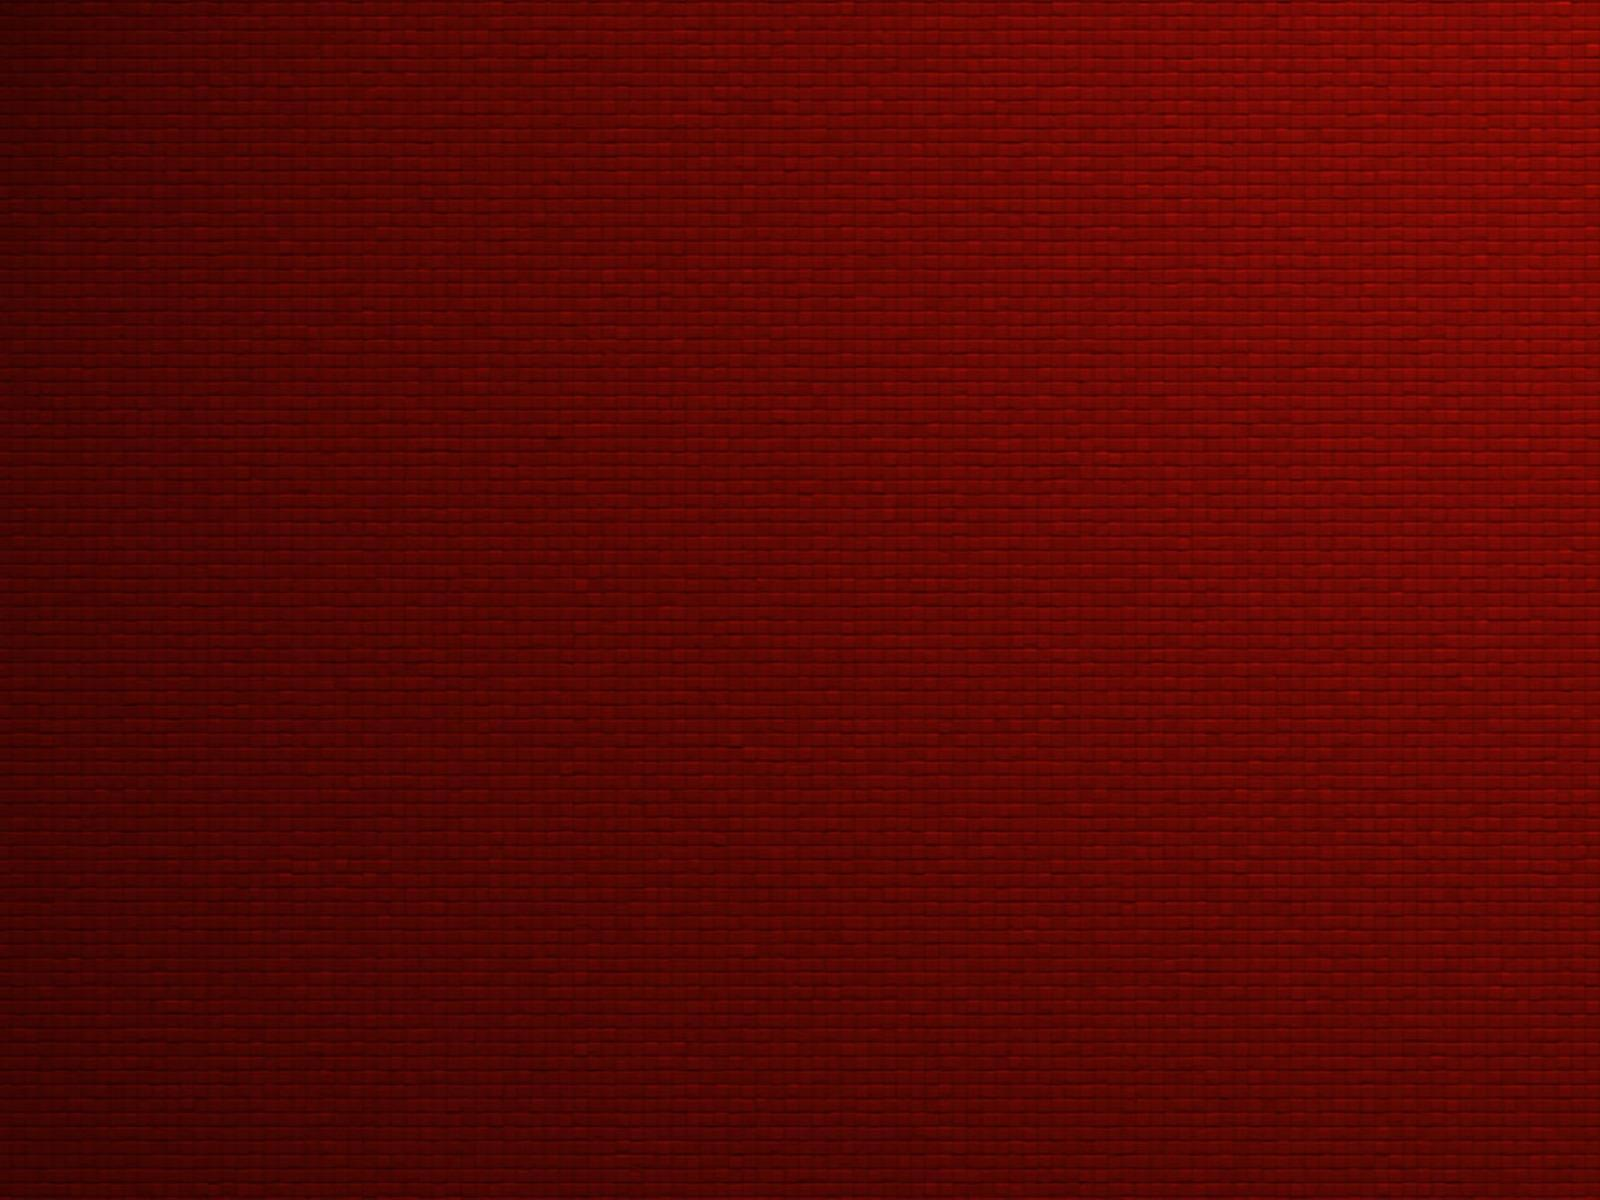 1600x1200 Red Desktop Wallpaper Abstract Red Wallpaper 1600x1200